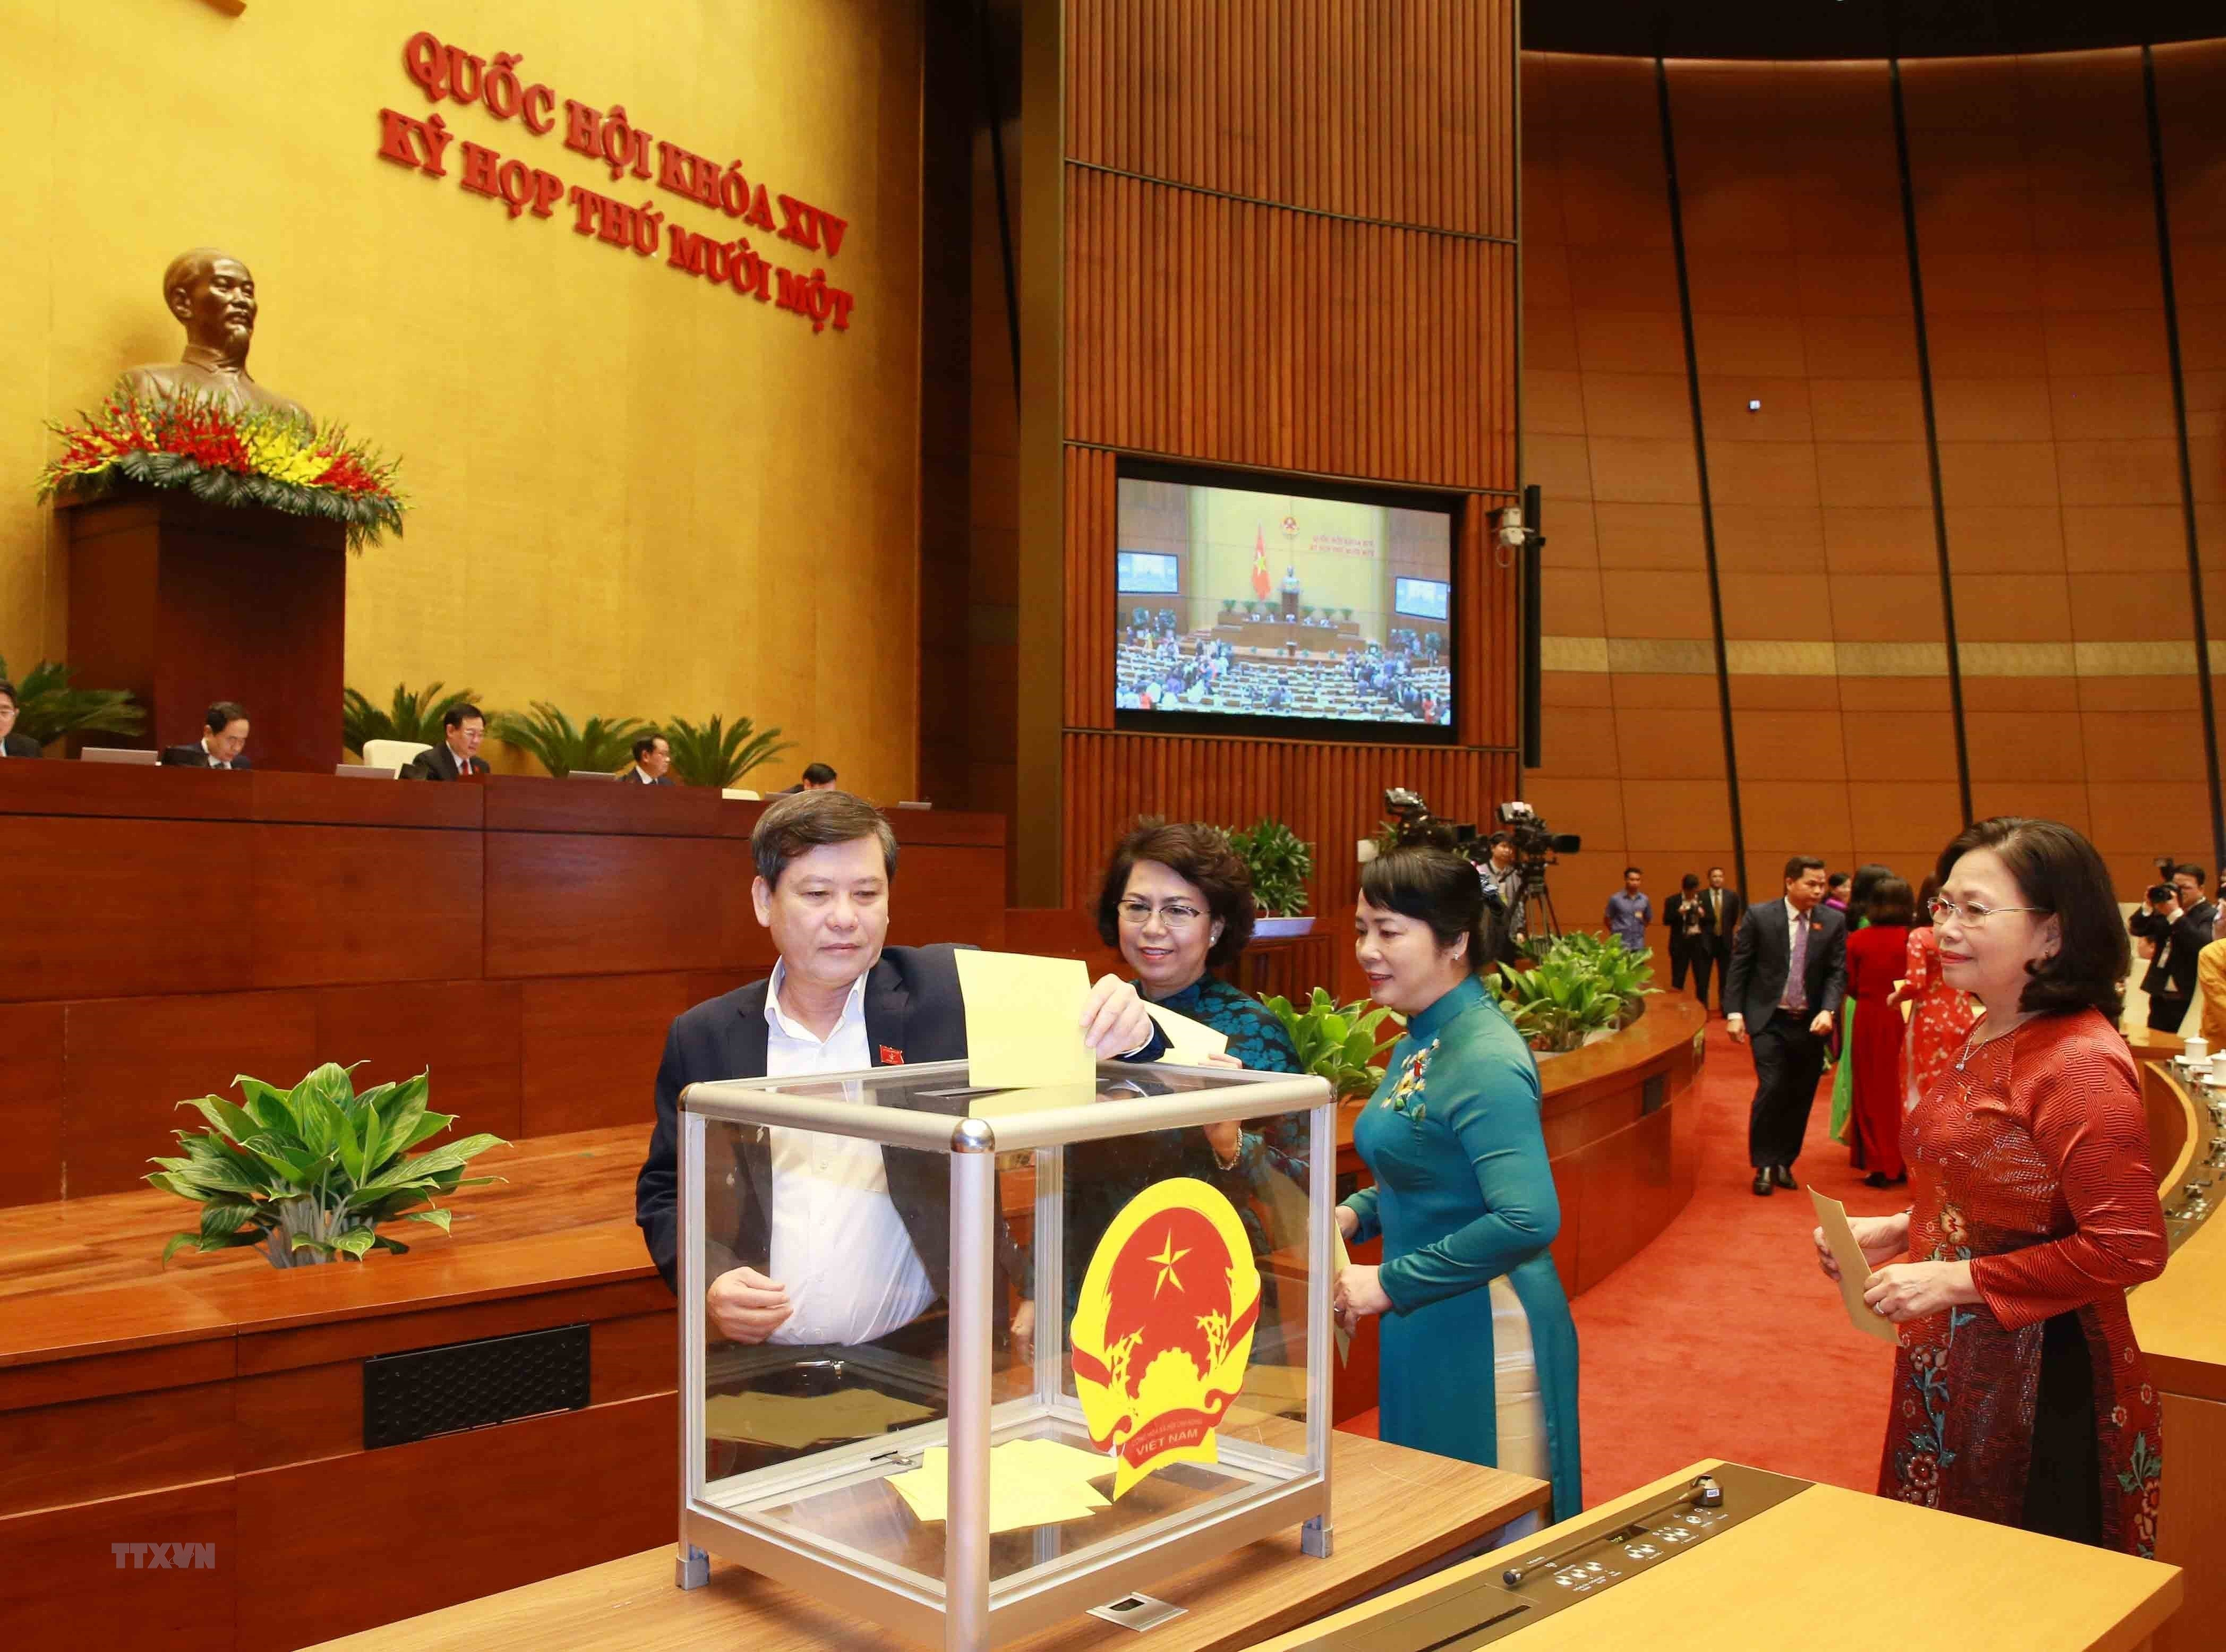 [Photo] Quoc hoi tien hanh quy trinh bo phieu bau Chu tich nuoc hinh anh 9